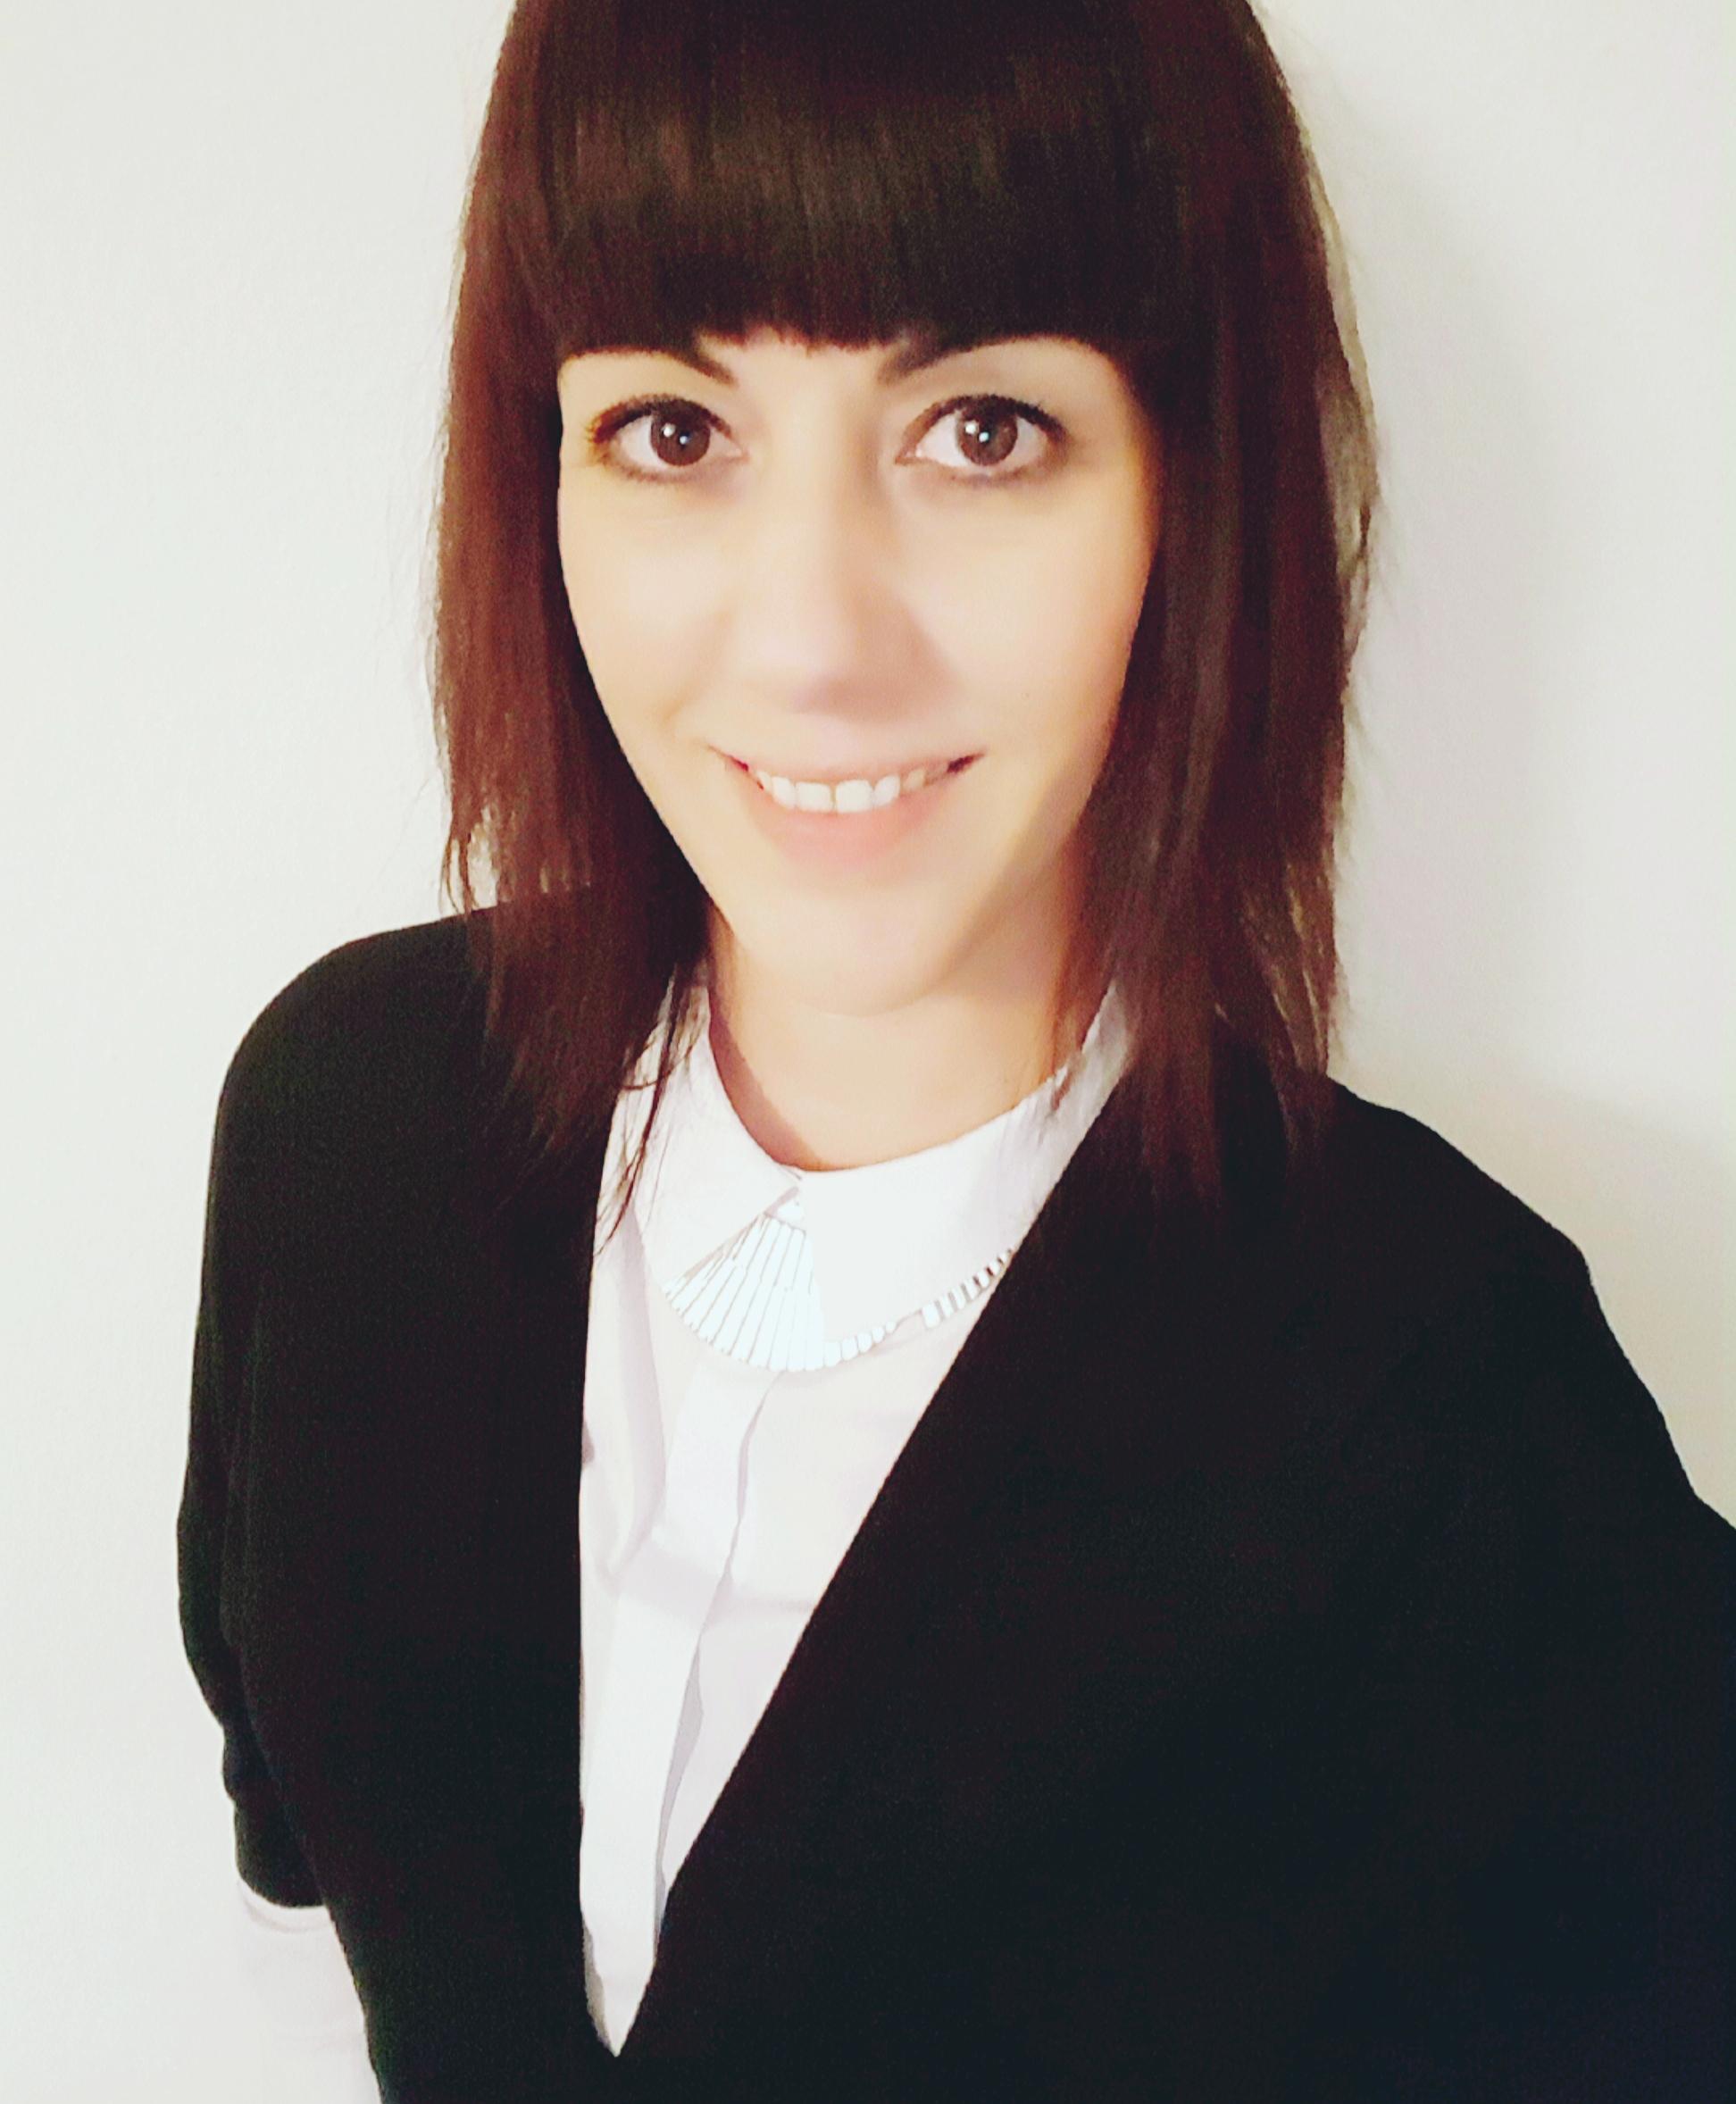 Katharina Wagner, Redakteurin, Moderatorin, Social Media Betreuung